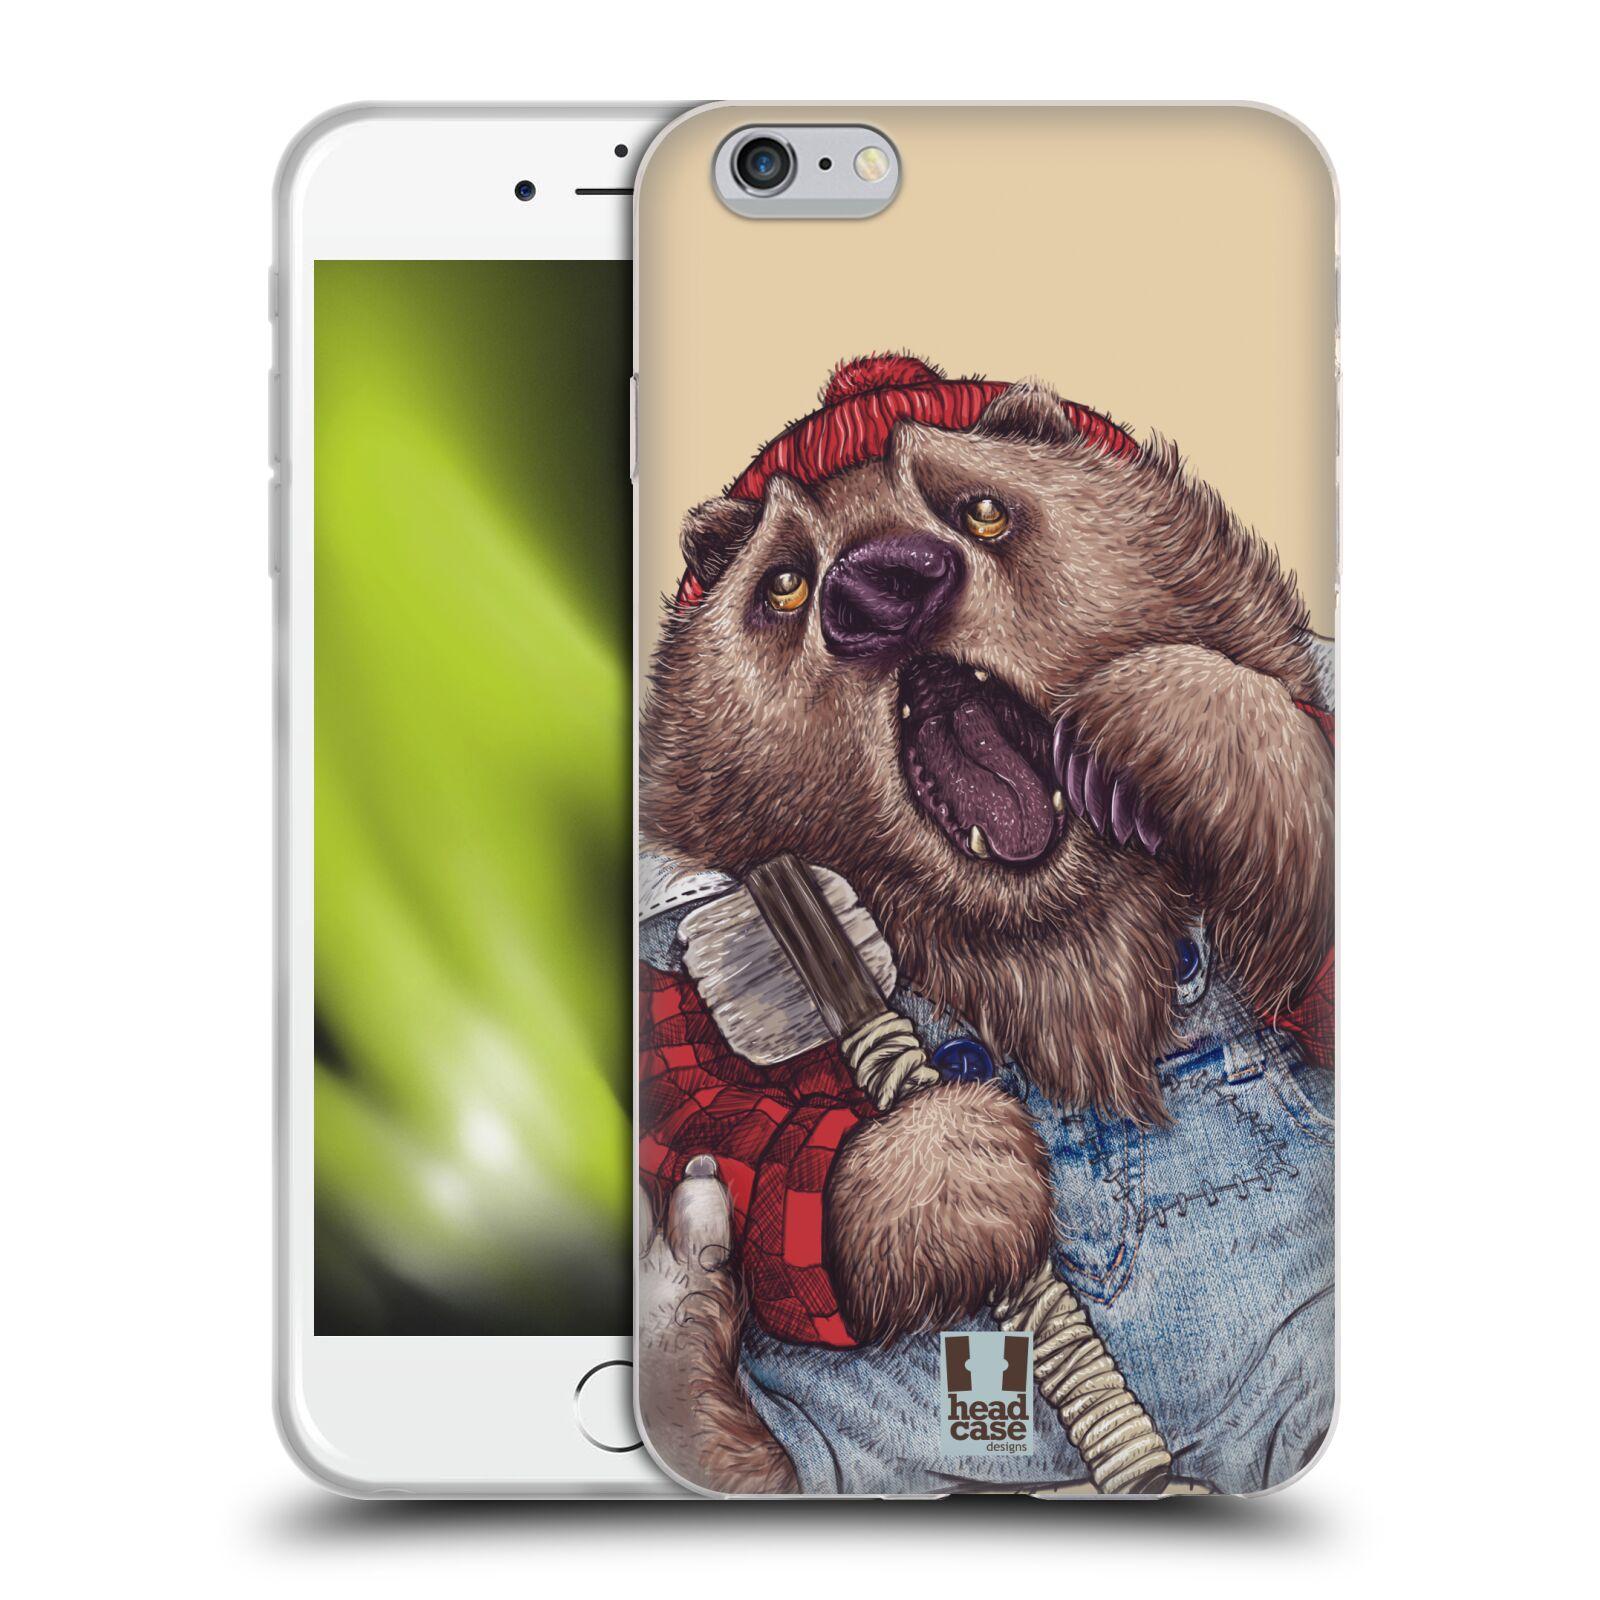 HEAD CASE silikonový obal na mobil Apple Iphone 6 PLUS/ 6S PLUS vzor Kreslená zvířátka medvěd